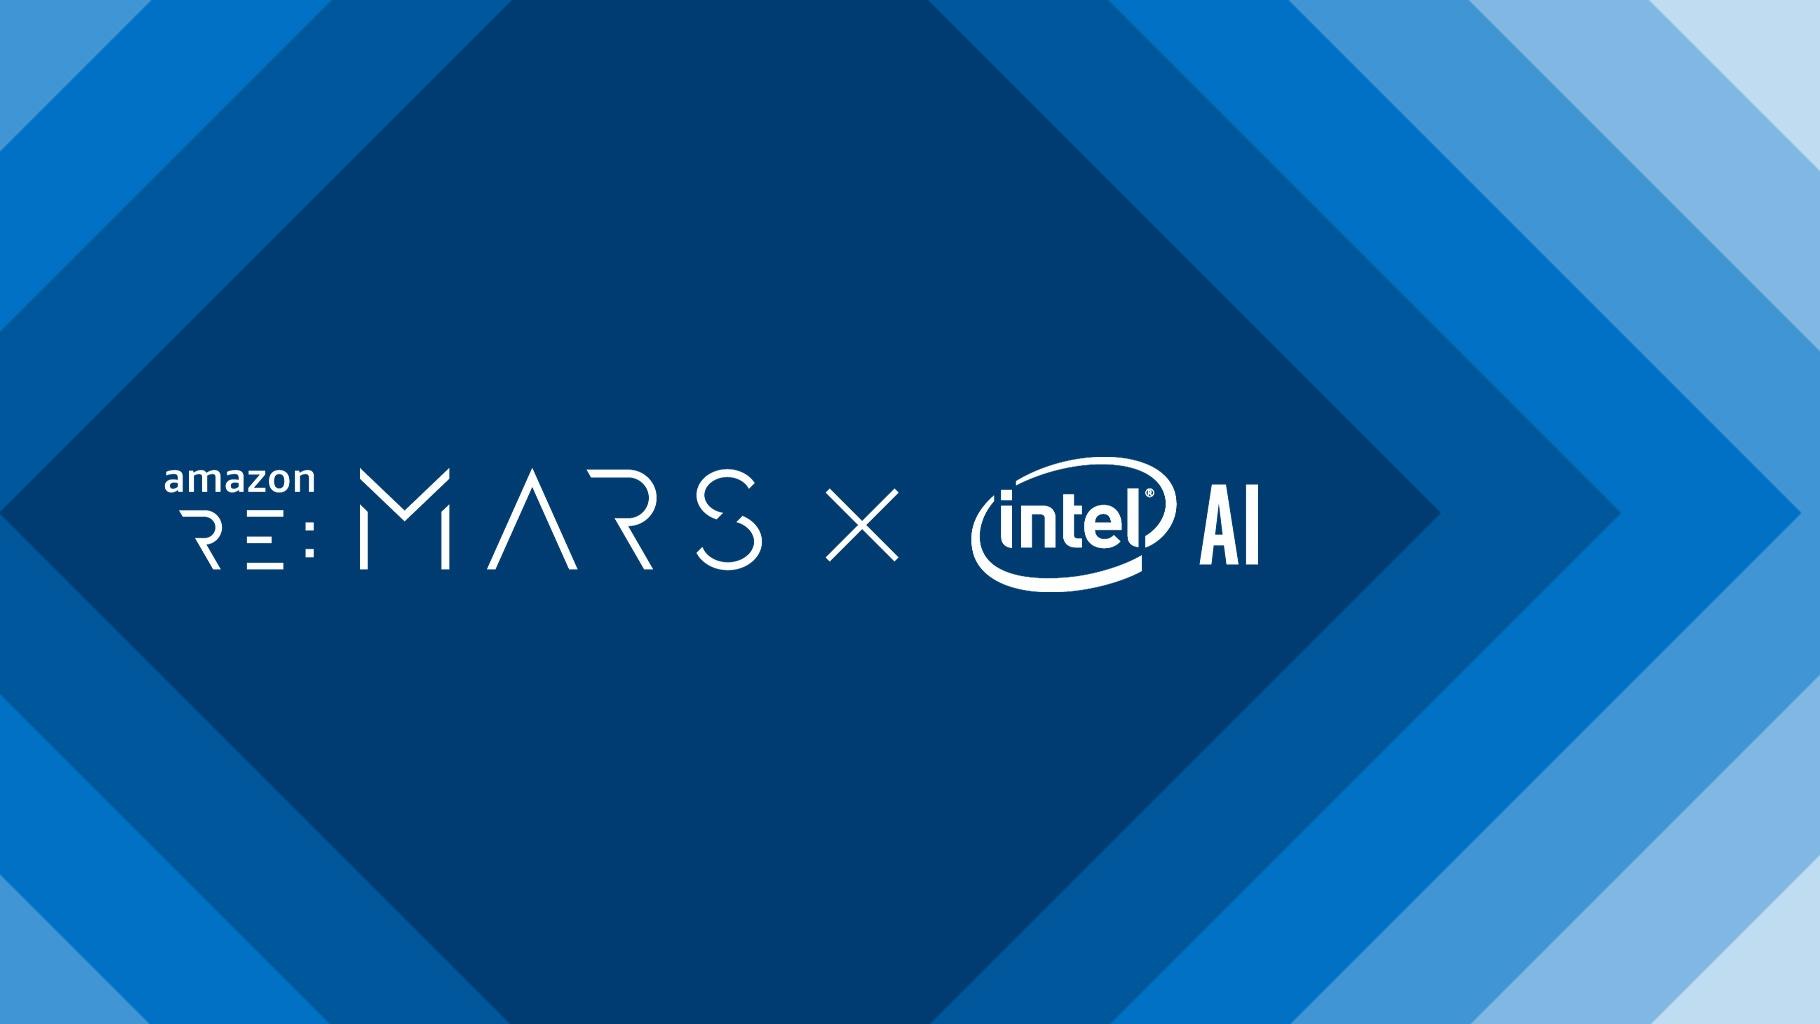 8d4fe7c89 Intel at amazon re MARS JUNE 4-7